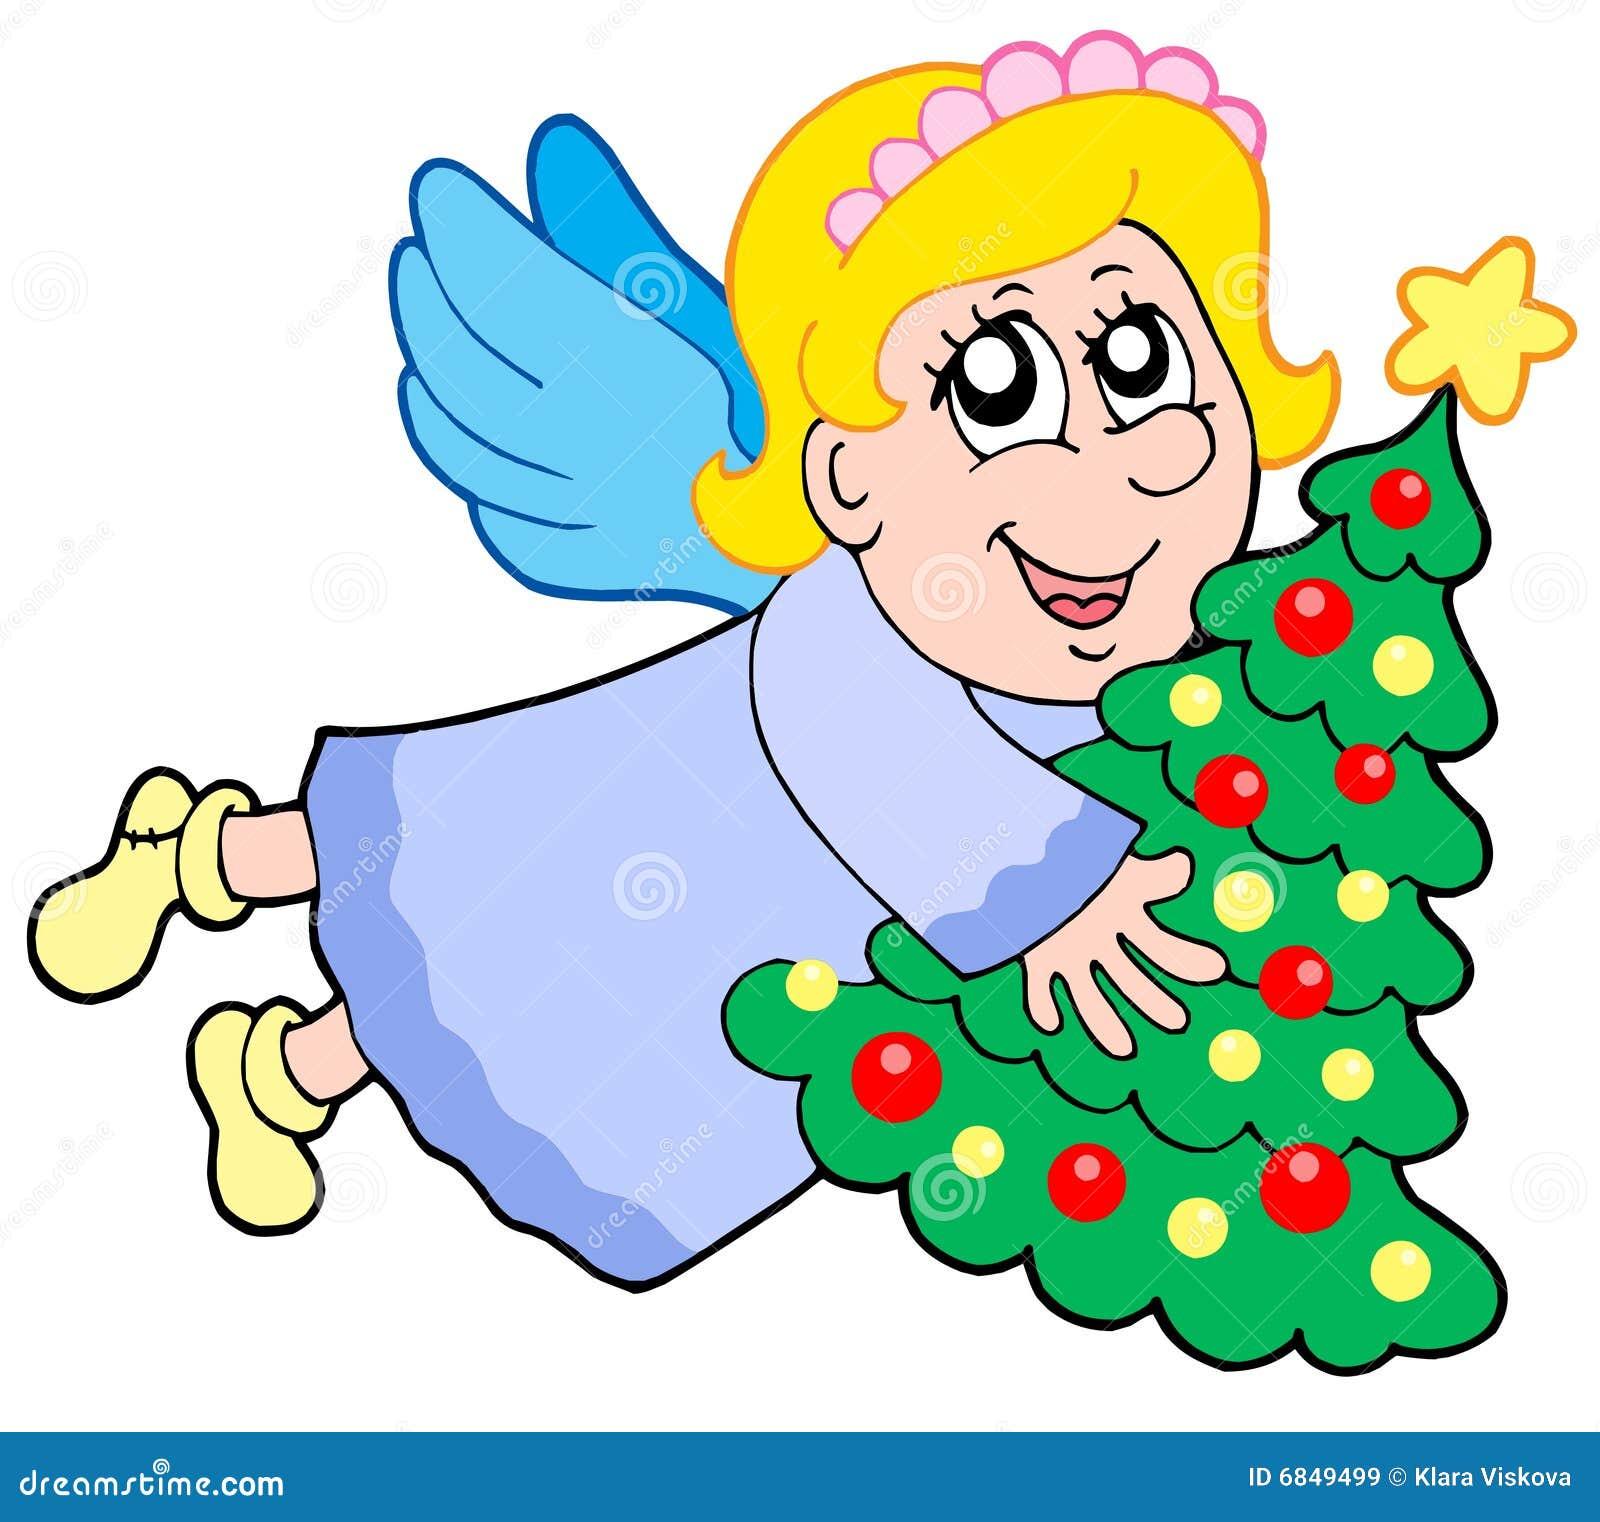 Angel Christmas Tree Stock Illustrations 7 944 Angel Christmas Tree Stock Illustrations Vectors Clipart Dreamstime Vector clip art illustration with. dreamstime com